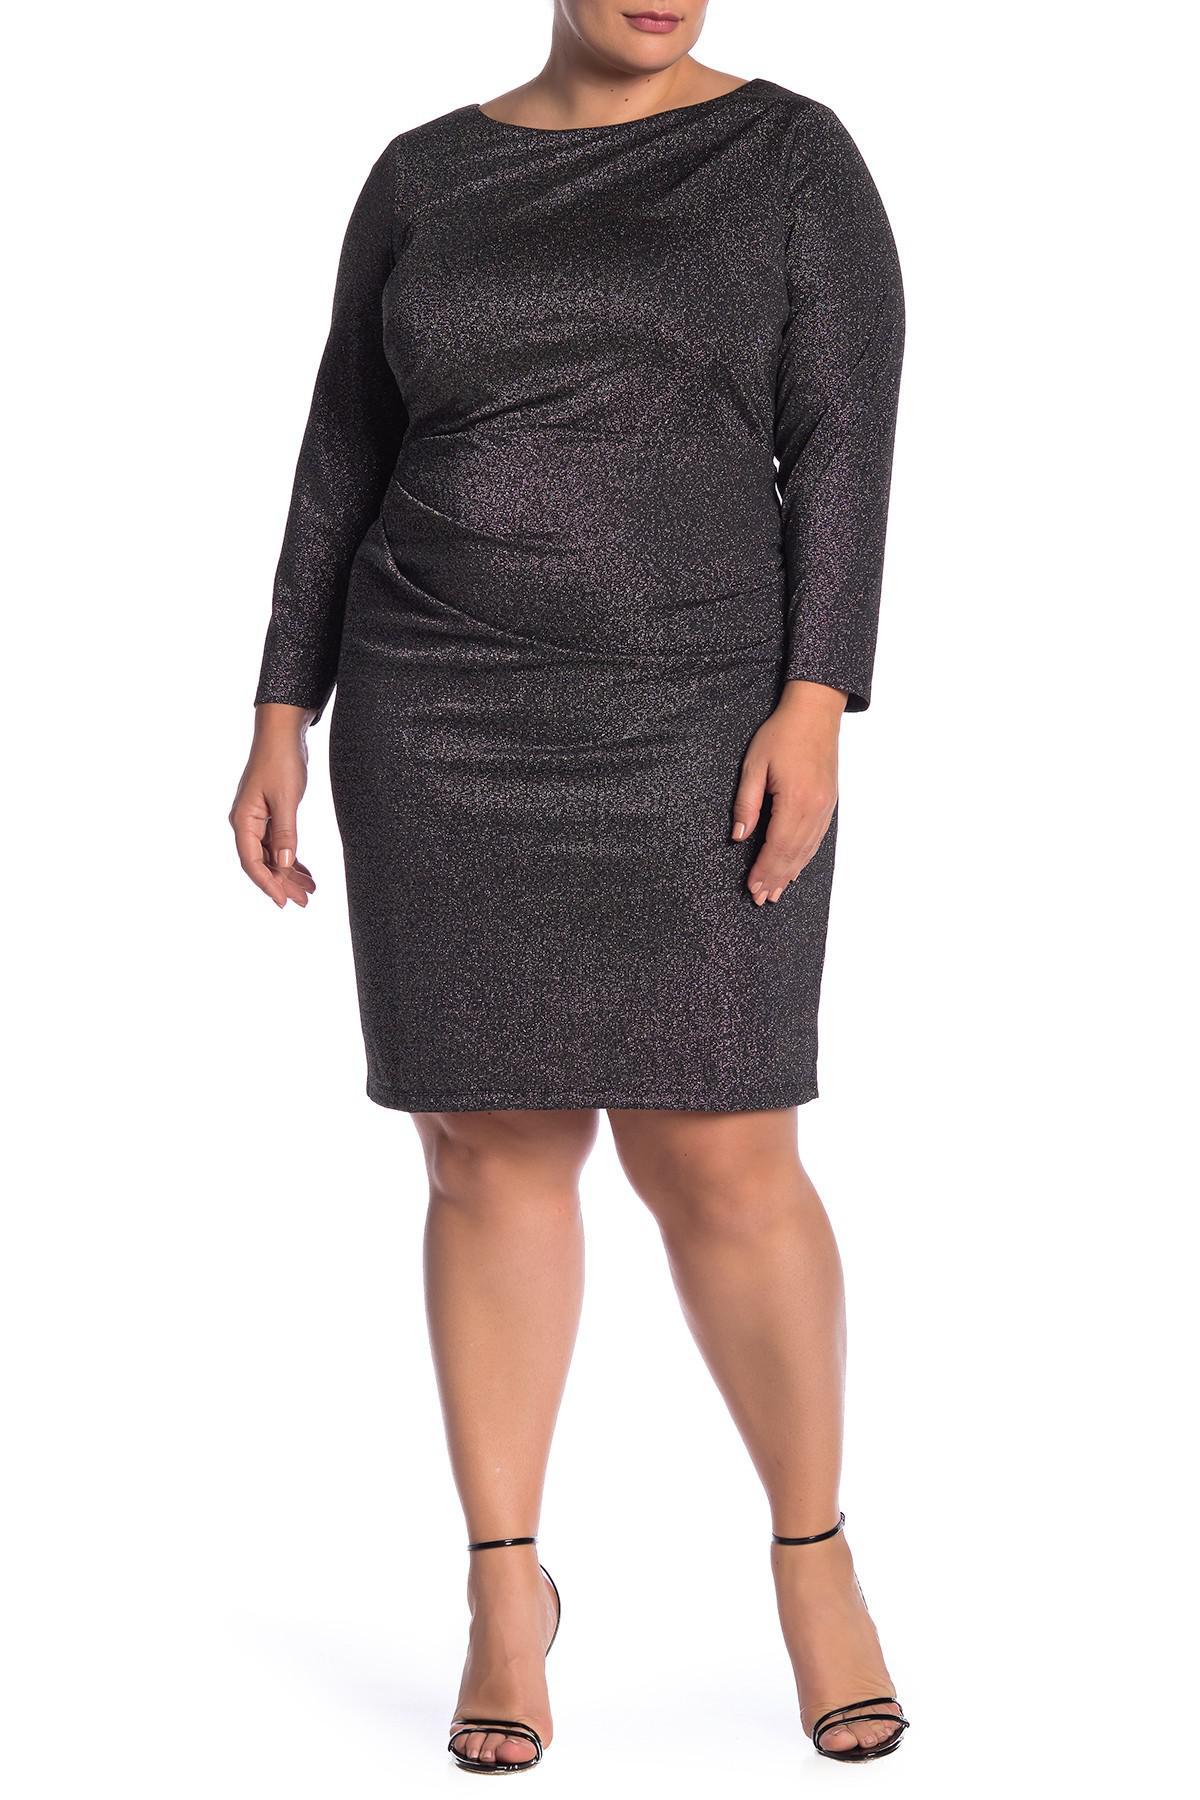 b8ccd42fb50 Lyst - Eliza J Sparkle Knit Bodycon Dress (plus Size) in Black